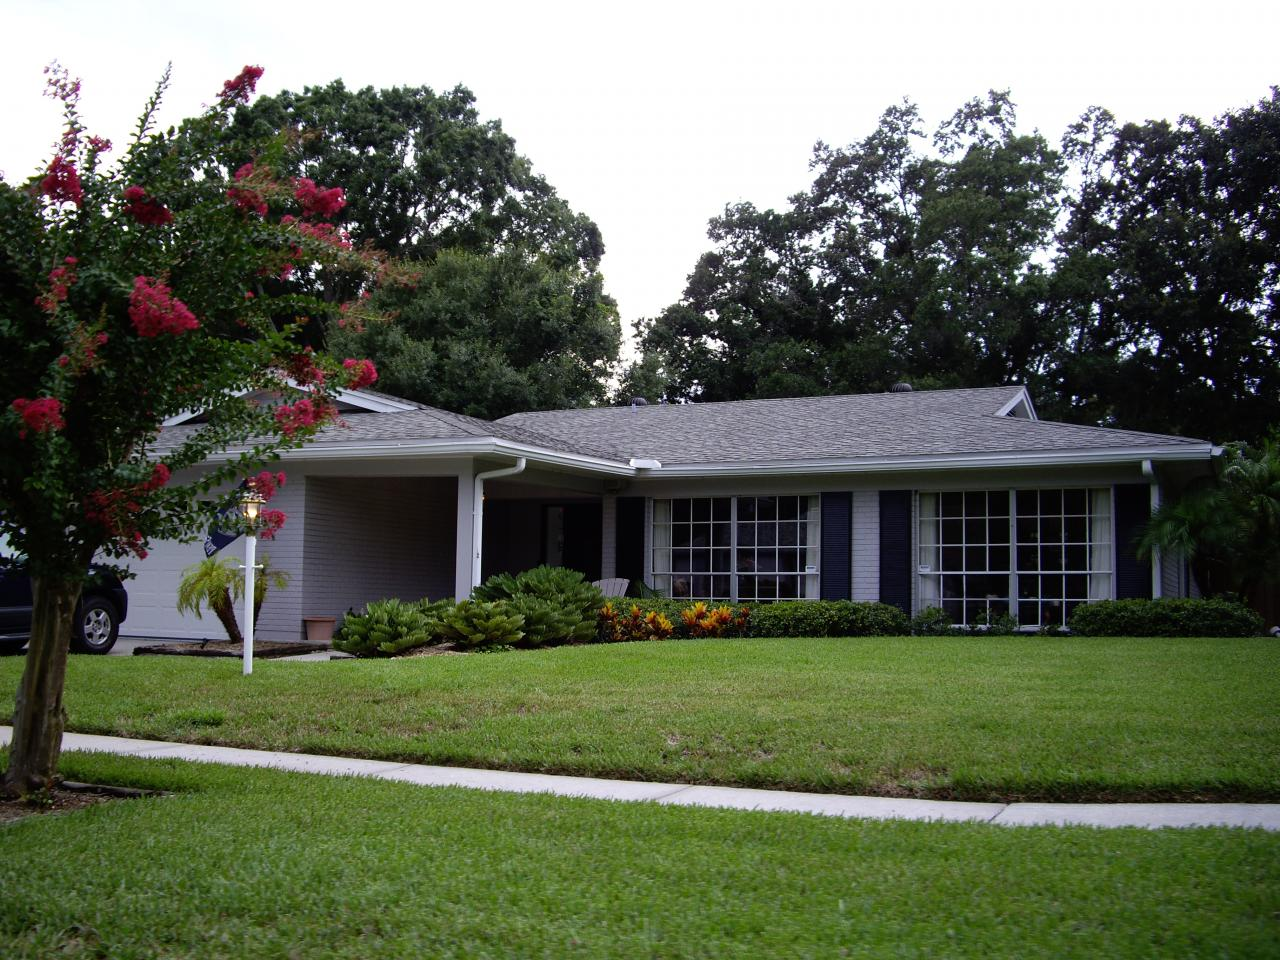 Villa US Brunoricaine